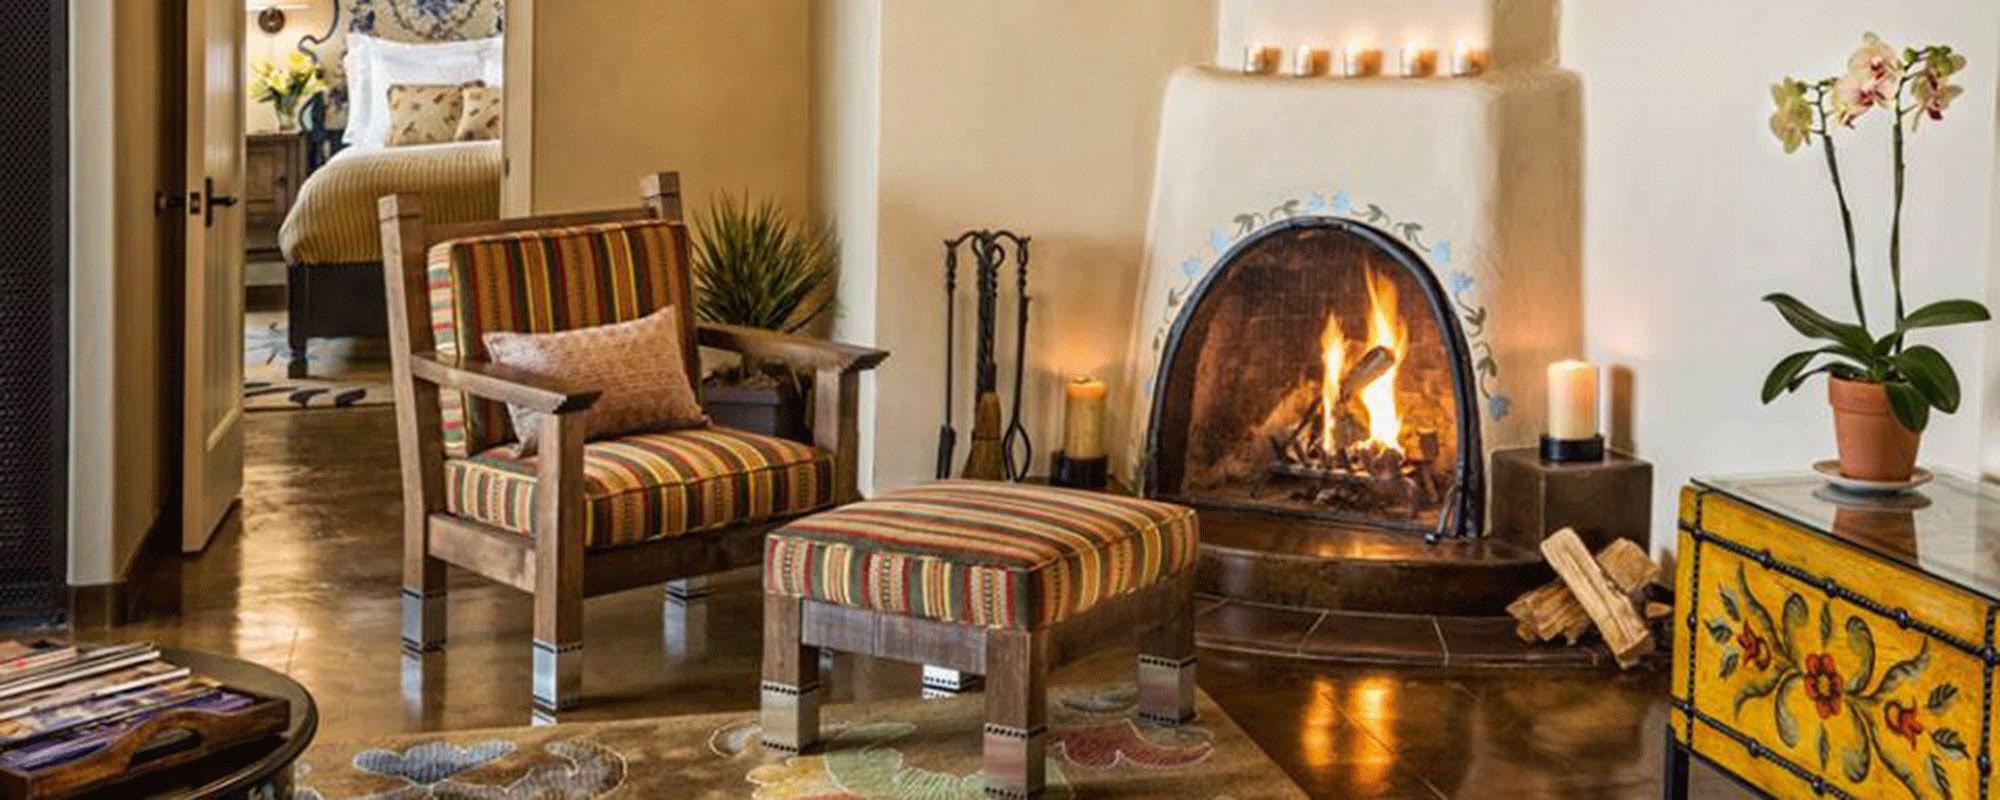 Samantha Brown Places To Love - Santa Fe